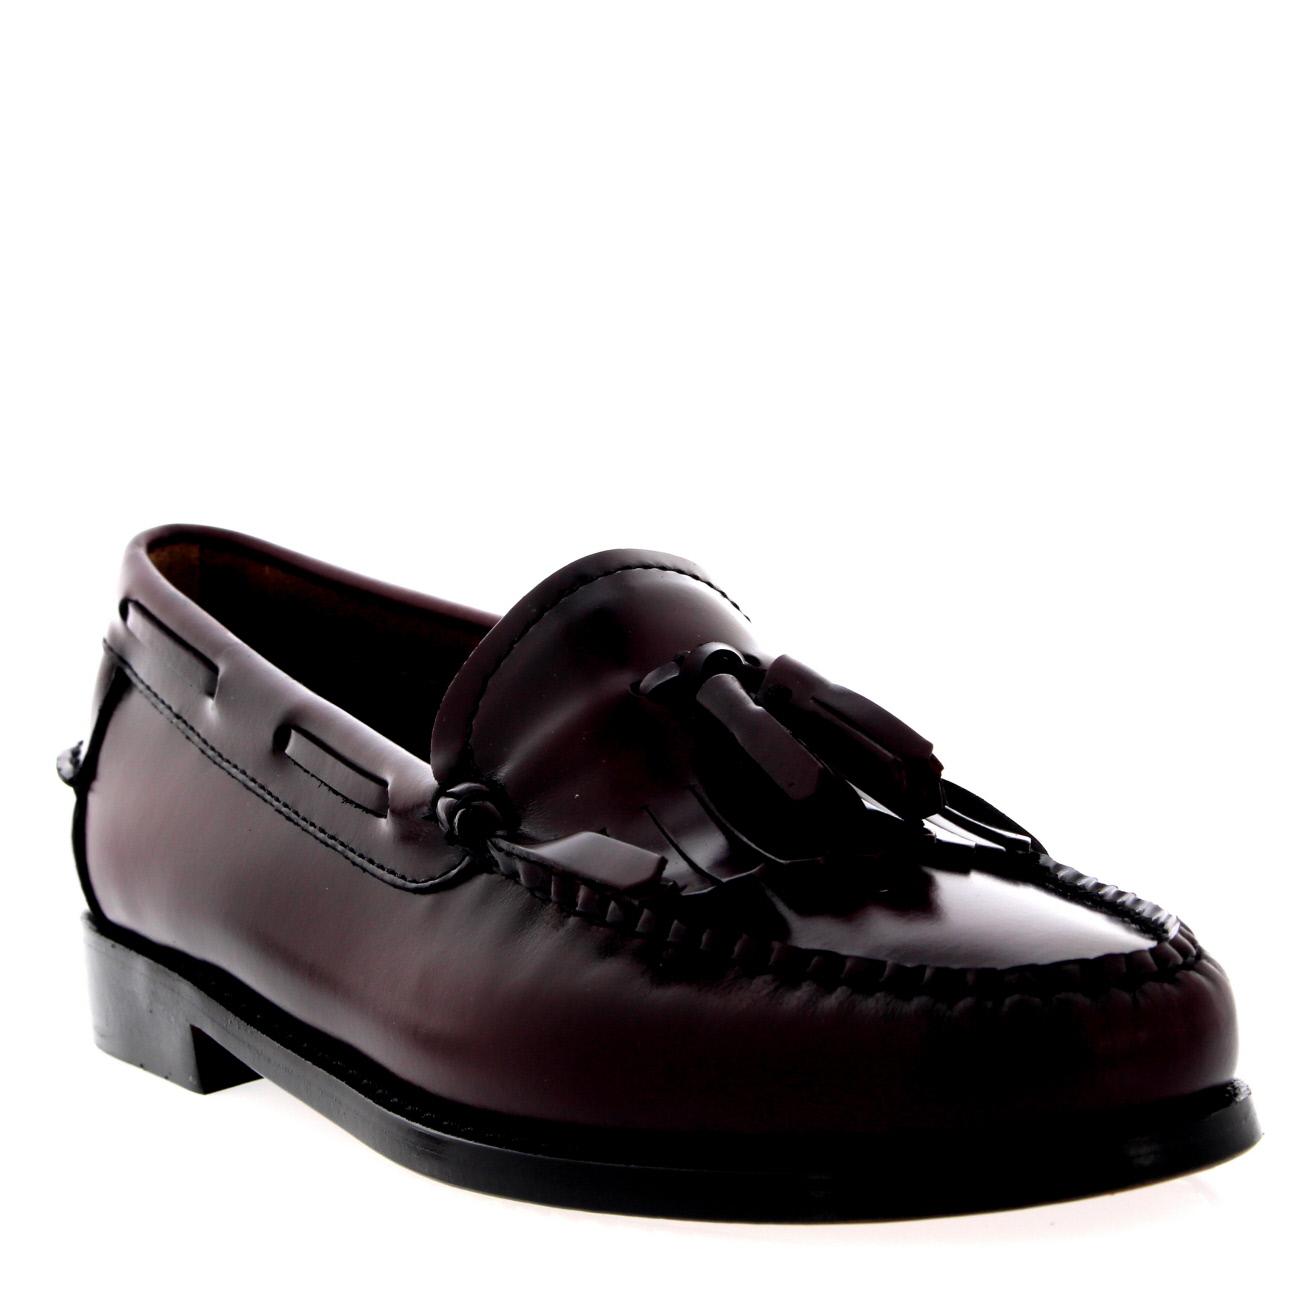 Kiltie Slip On Shoes